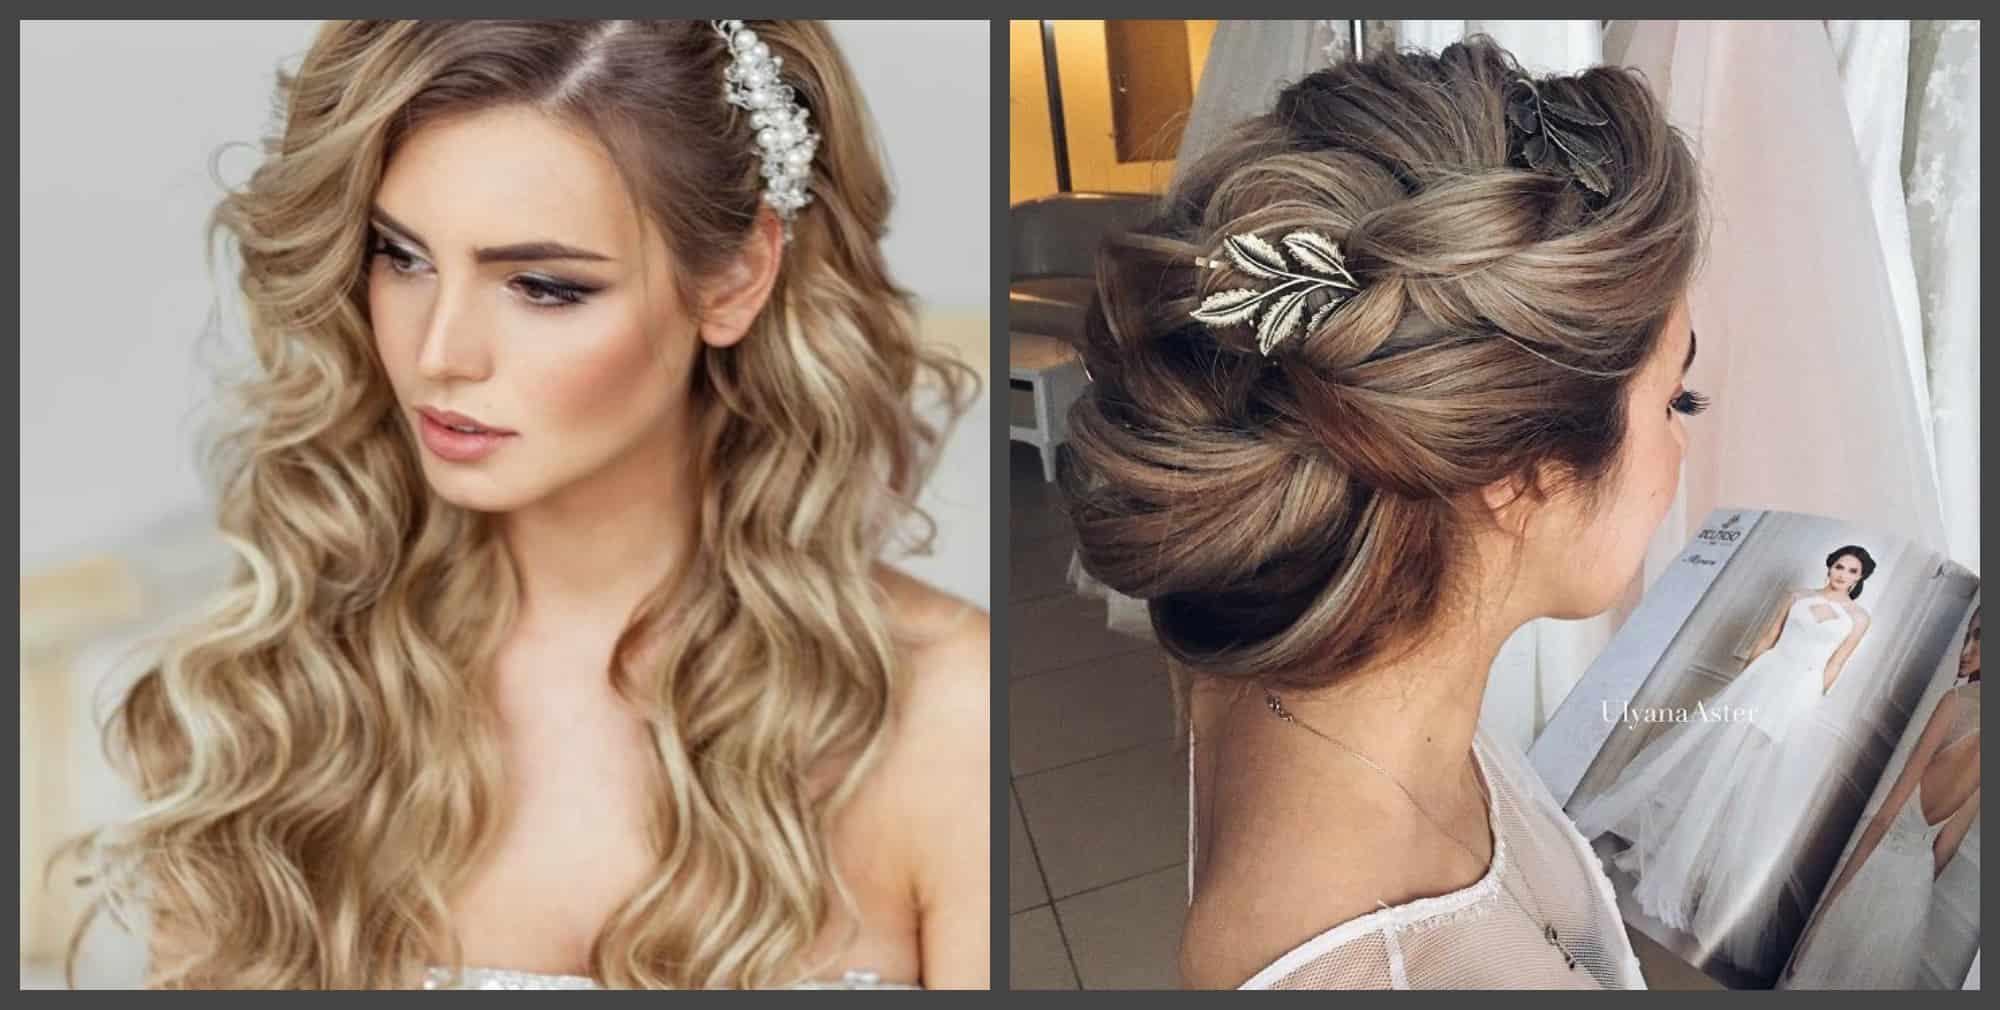 Peinados de boda 2018 peinados hermosos y de moda - Peinados actuales de moda ...